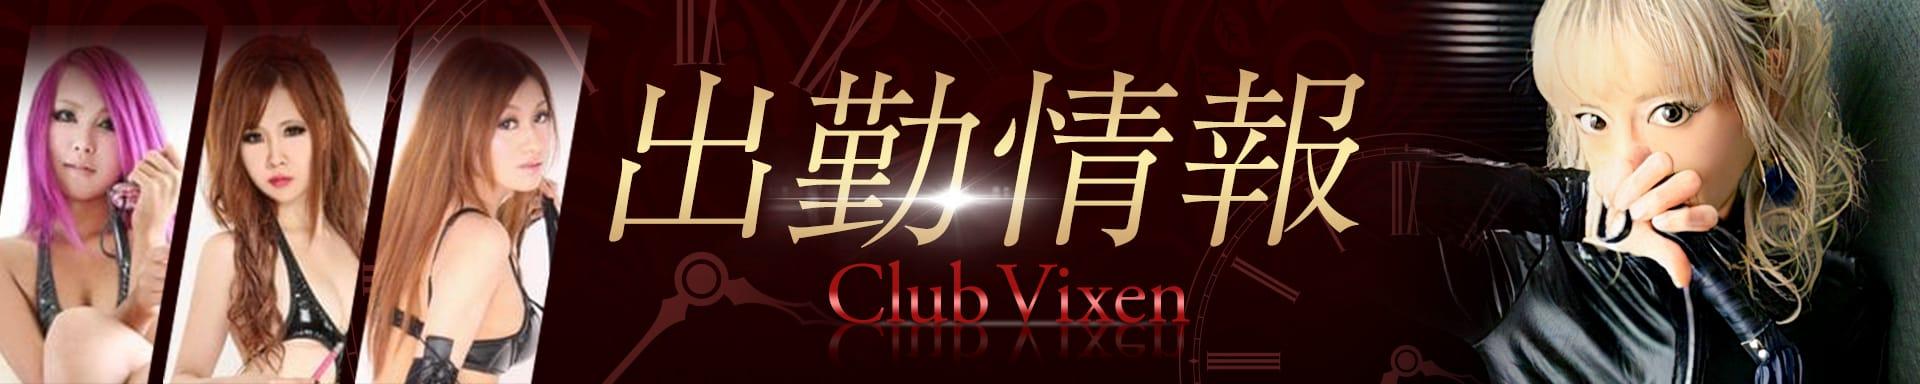 Club Vixen(クラブヴィクセン) その2